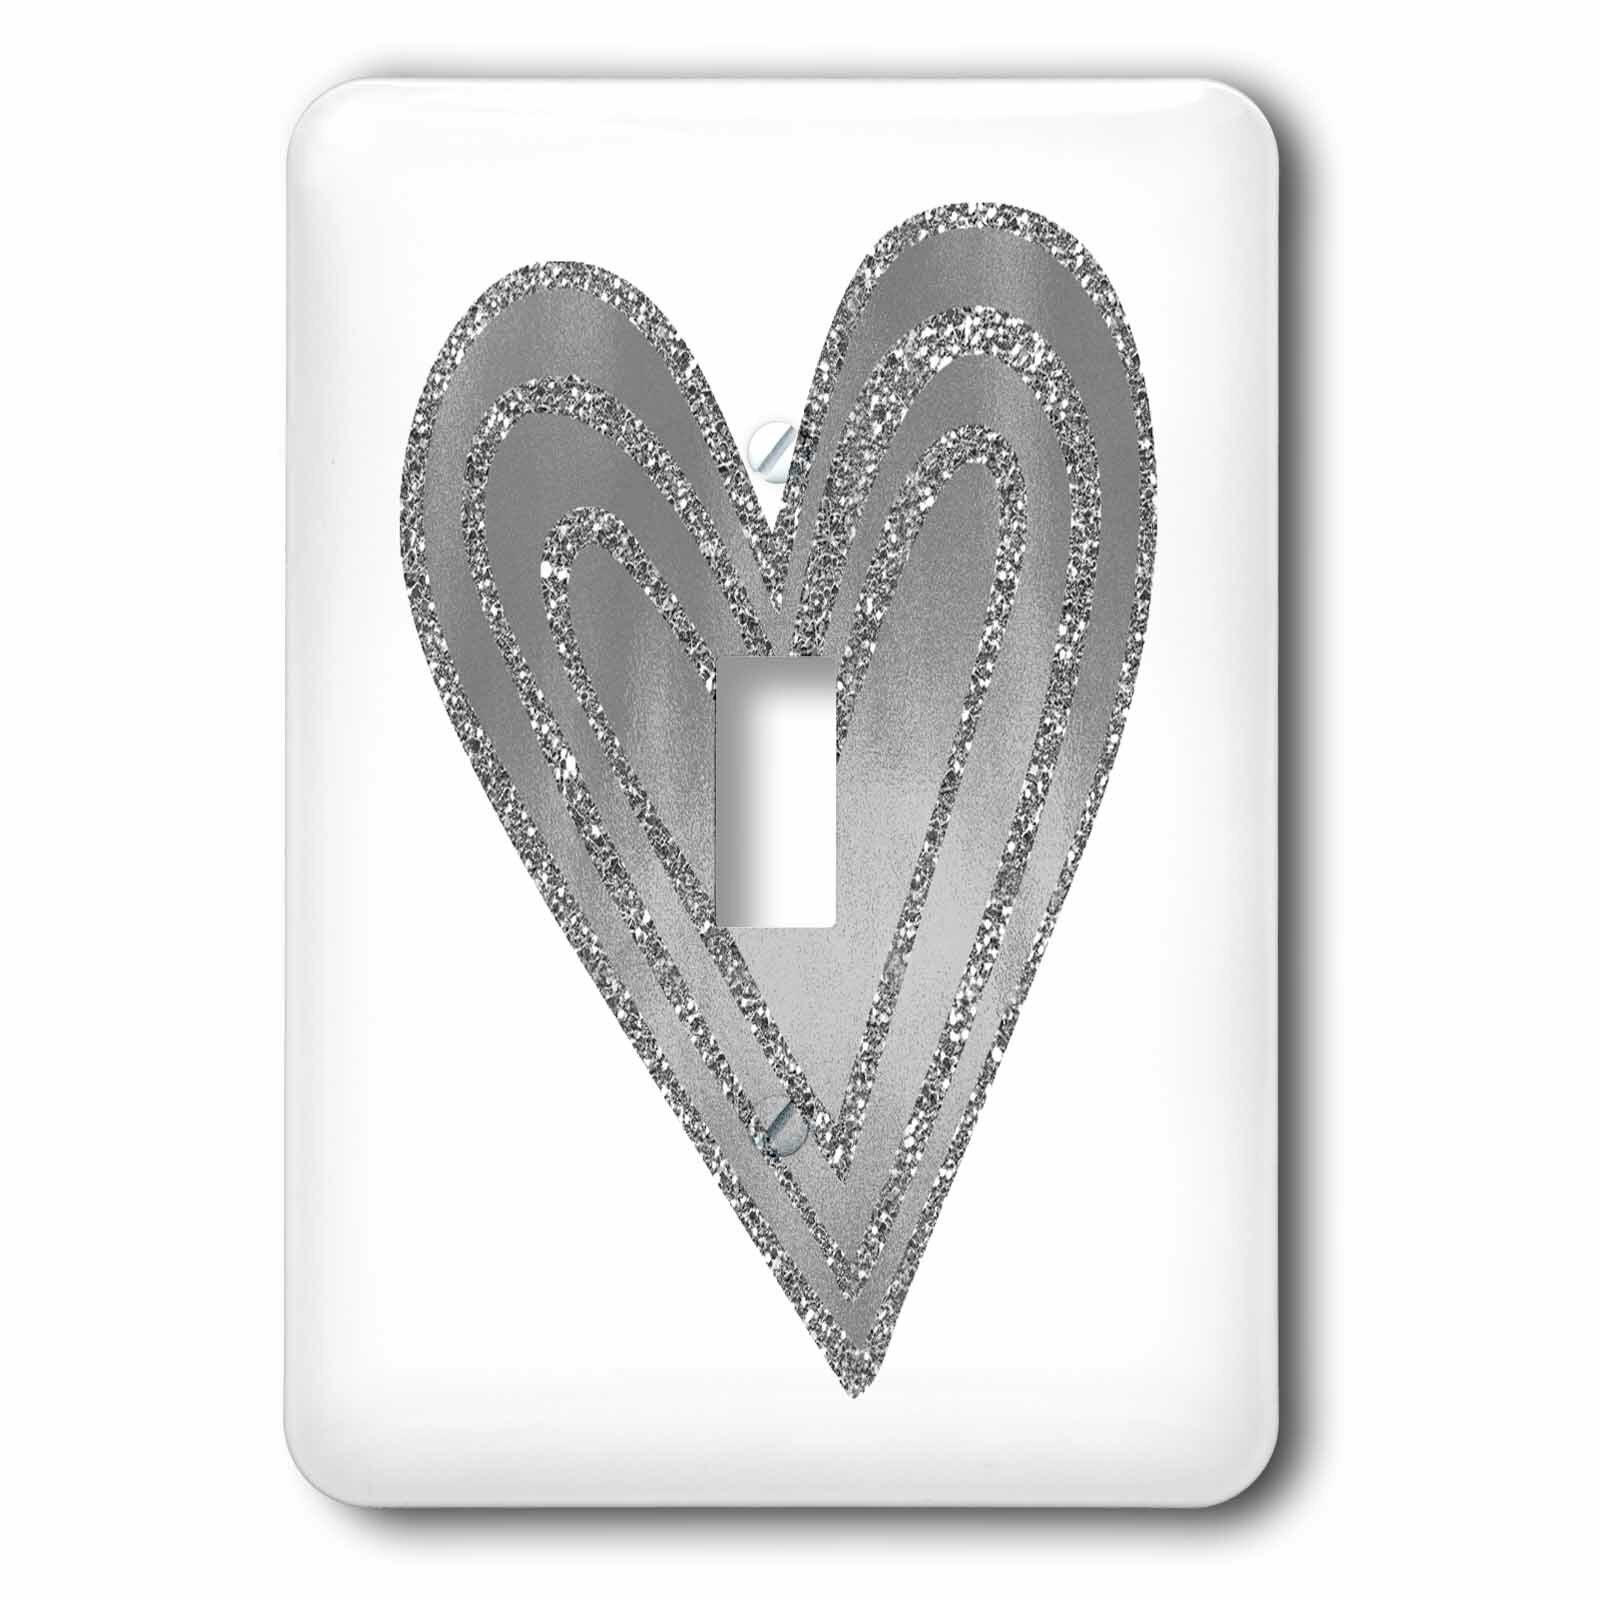 3drose Glam Heart 1 Gang Toggle Light Switch Wall Plate Wayfair